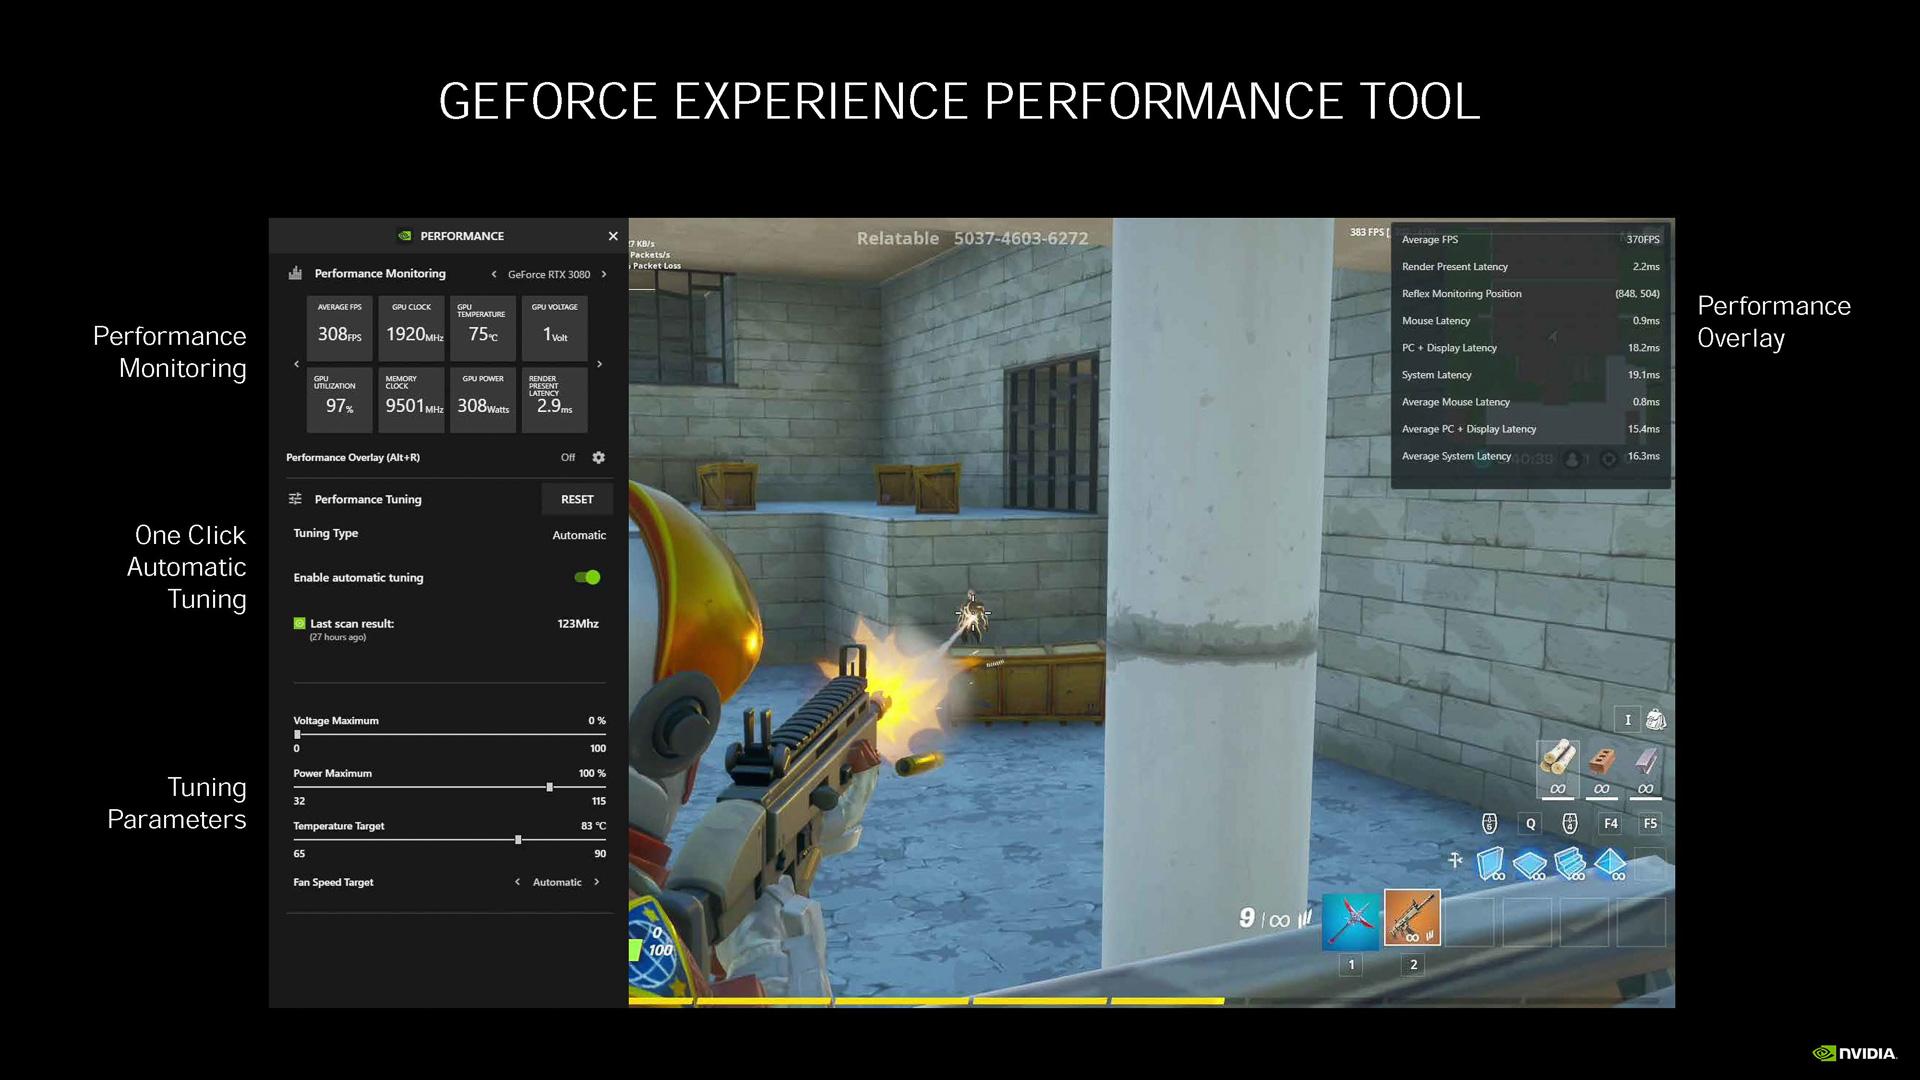 GeForce Experience Performance Tool